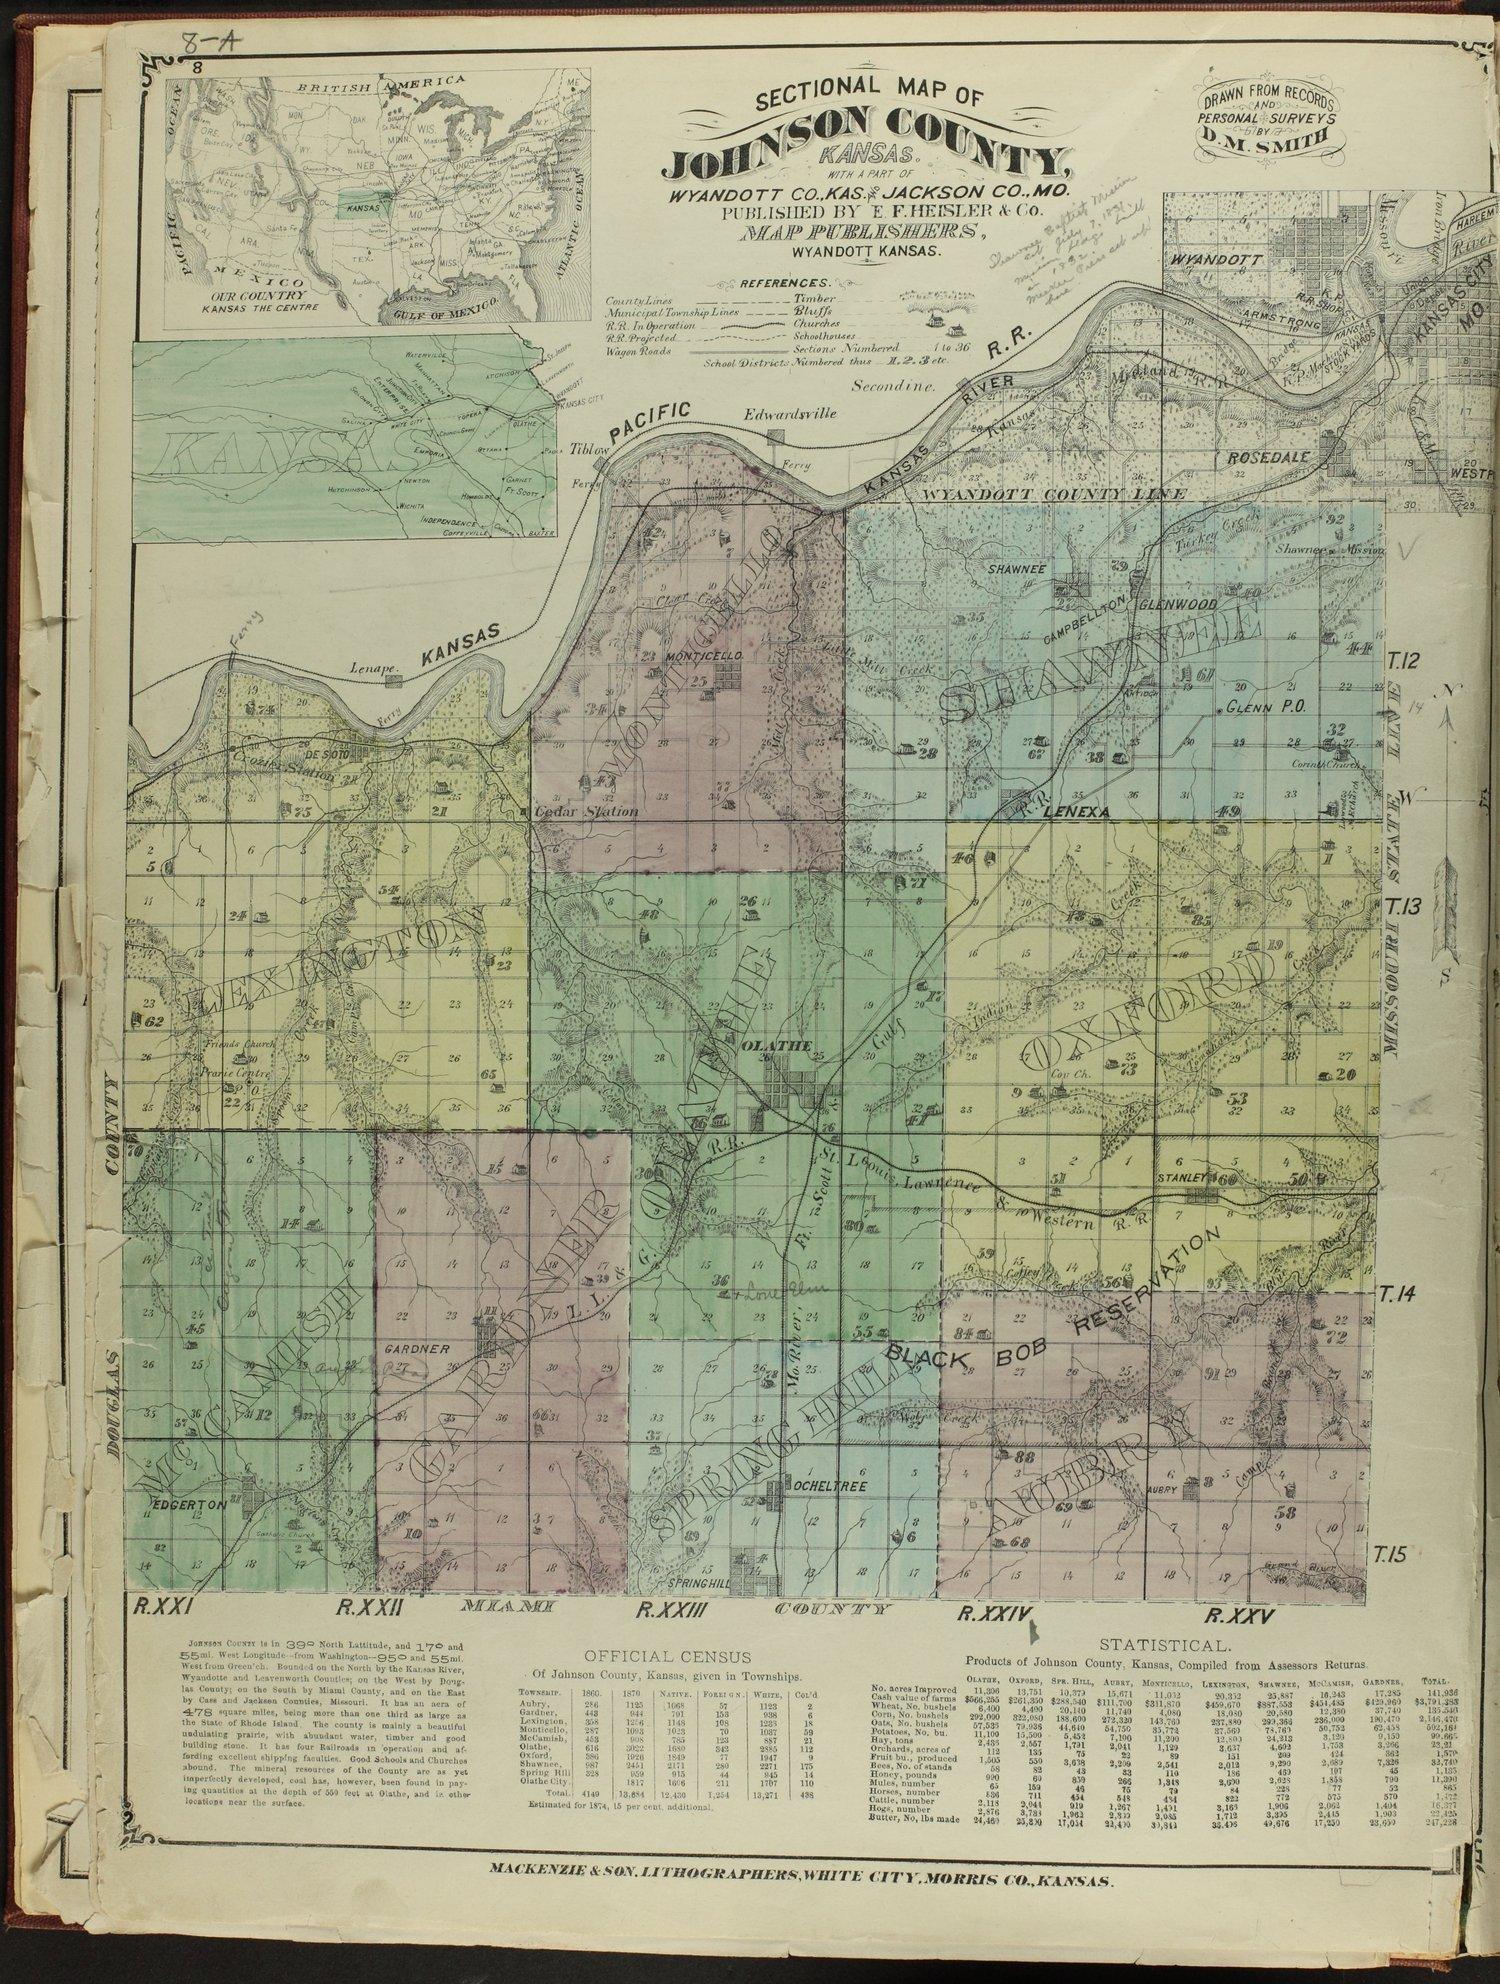 Atlas map of Johnson County, Kansas - 8